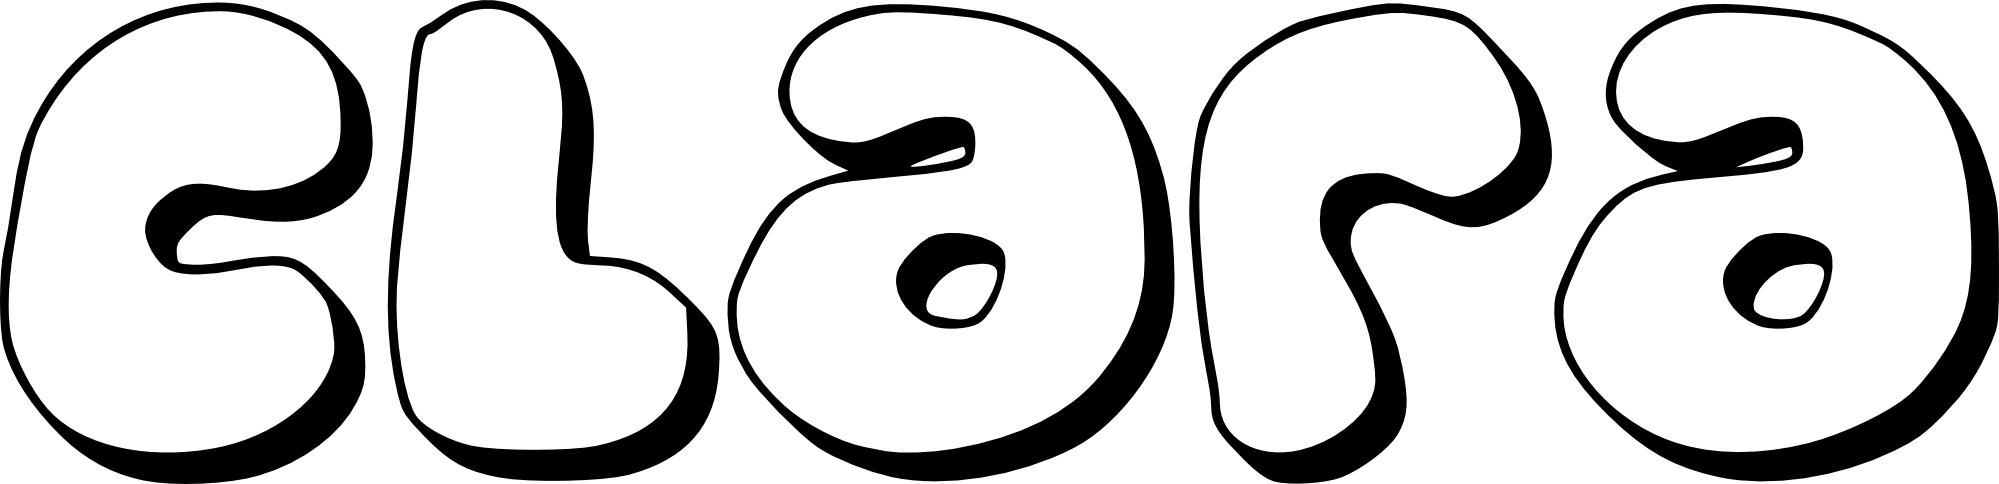 Dessin a coloriage prennon - Prenom en dessin ...